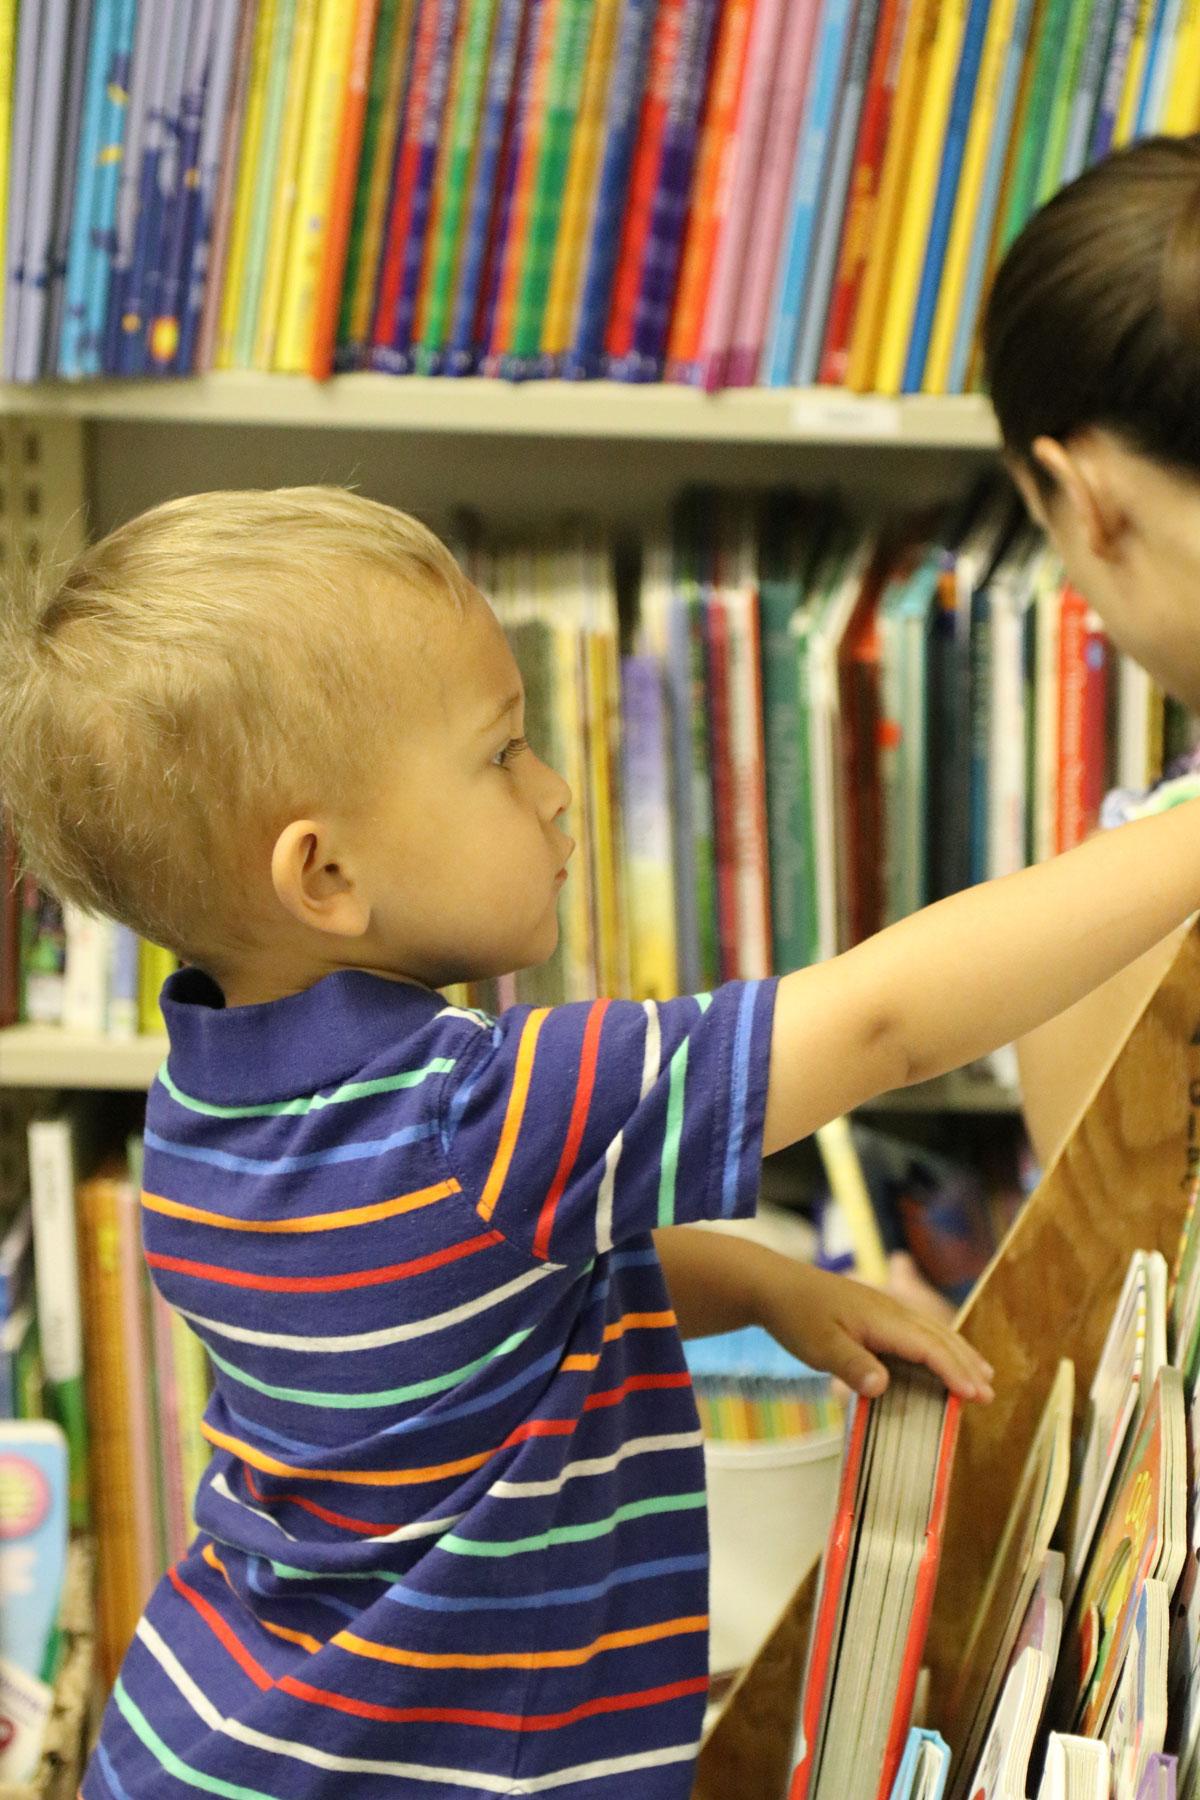 Child-with-Books.jpg